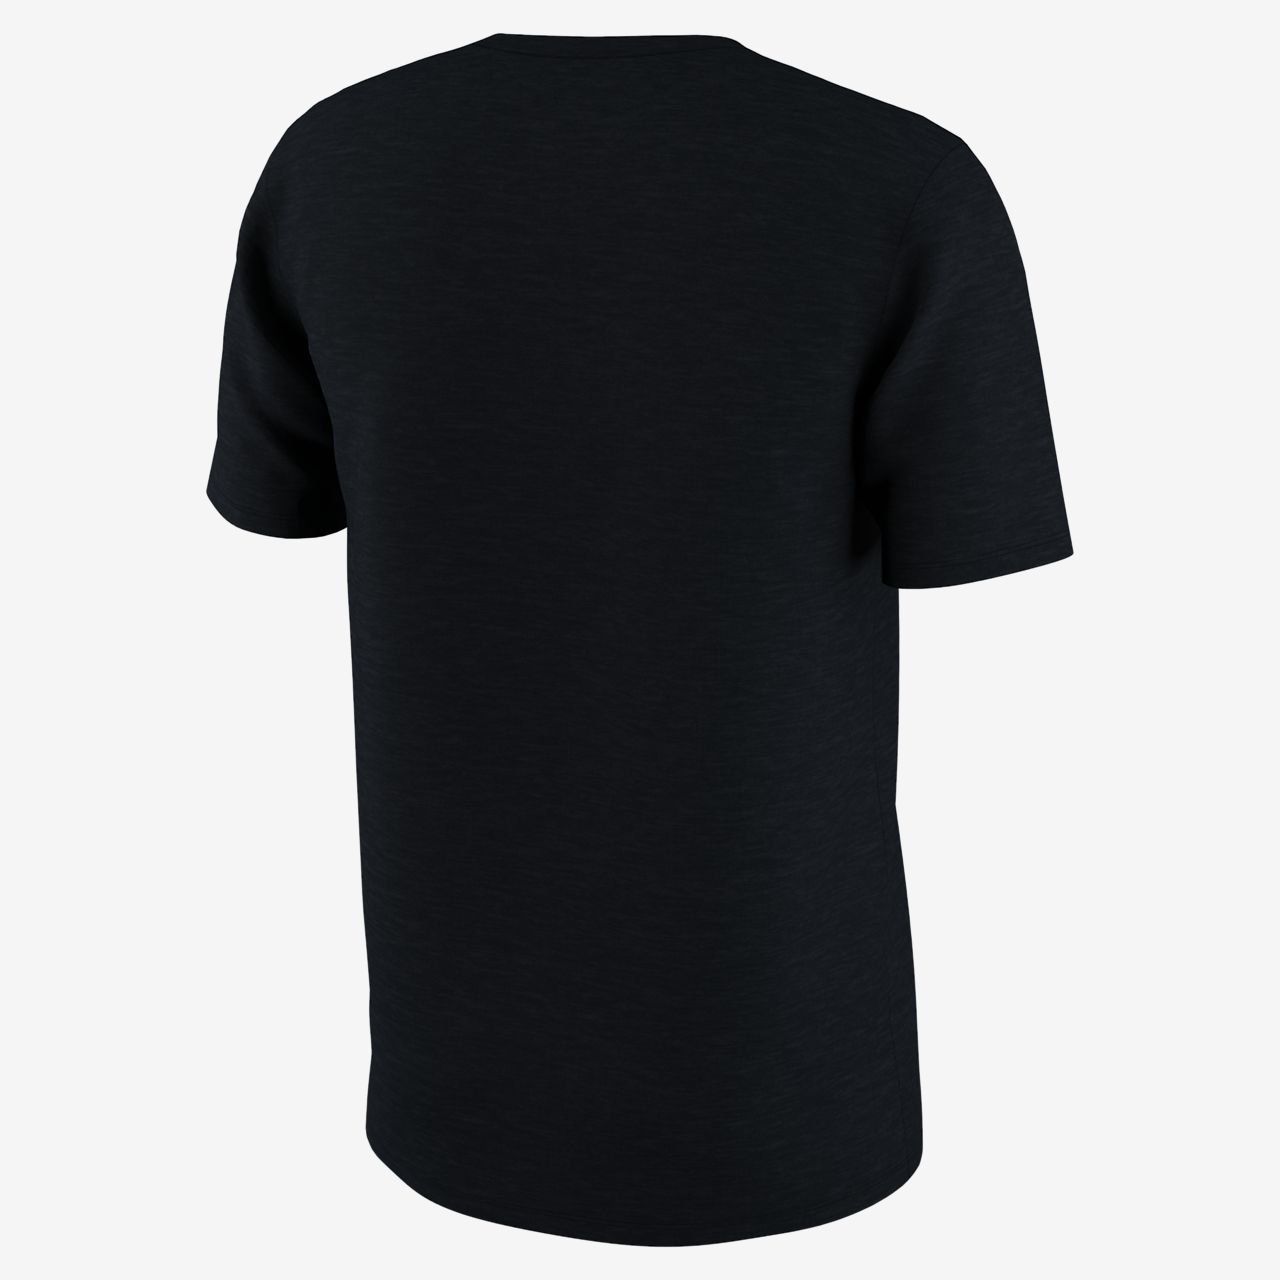 1280x1280 Nike Player Silhouette (Nfl Eagles Carson Wentz) Men's T Shirt